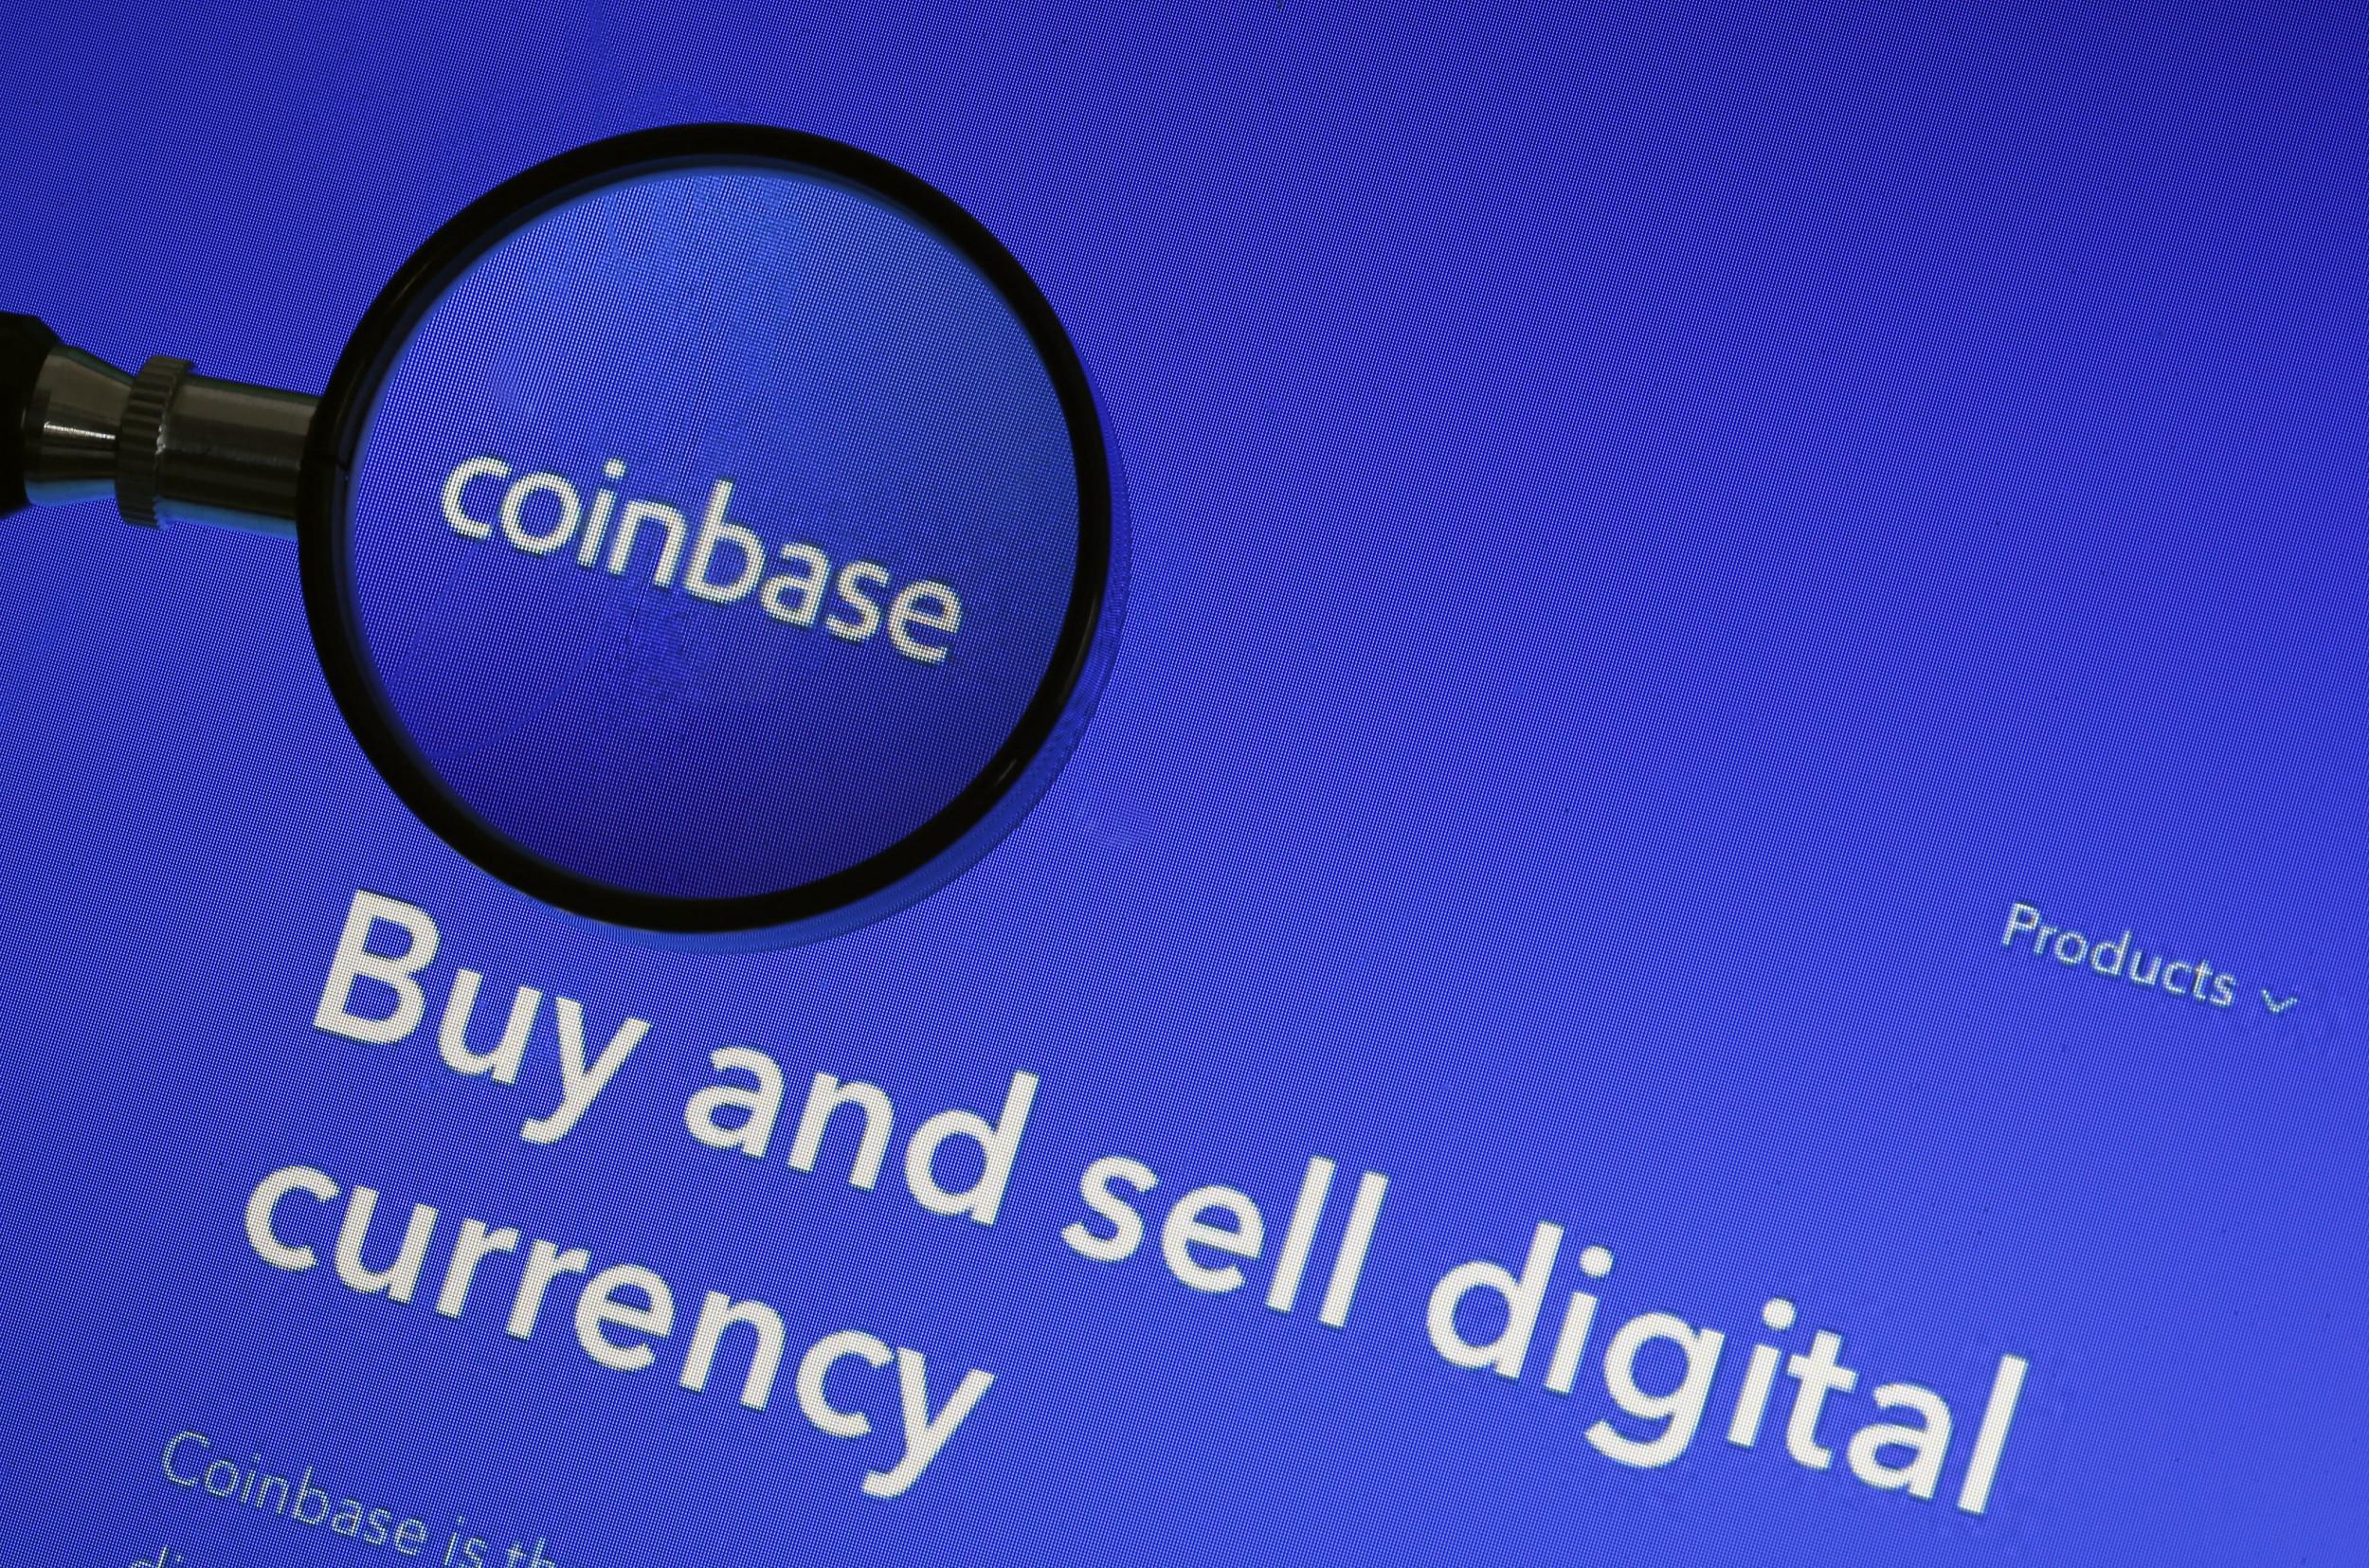 Galaxy Digital CEO Mike Novogratz Calls Coinbase IPO Cryptocurrency's 'Netscape Moment'